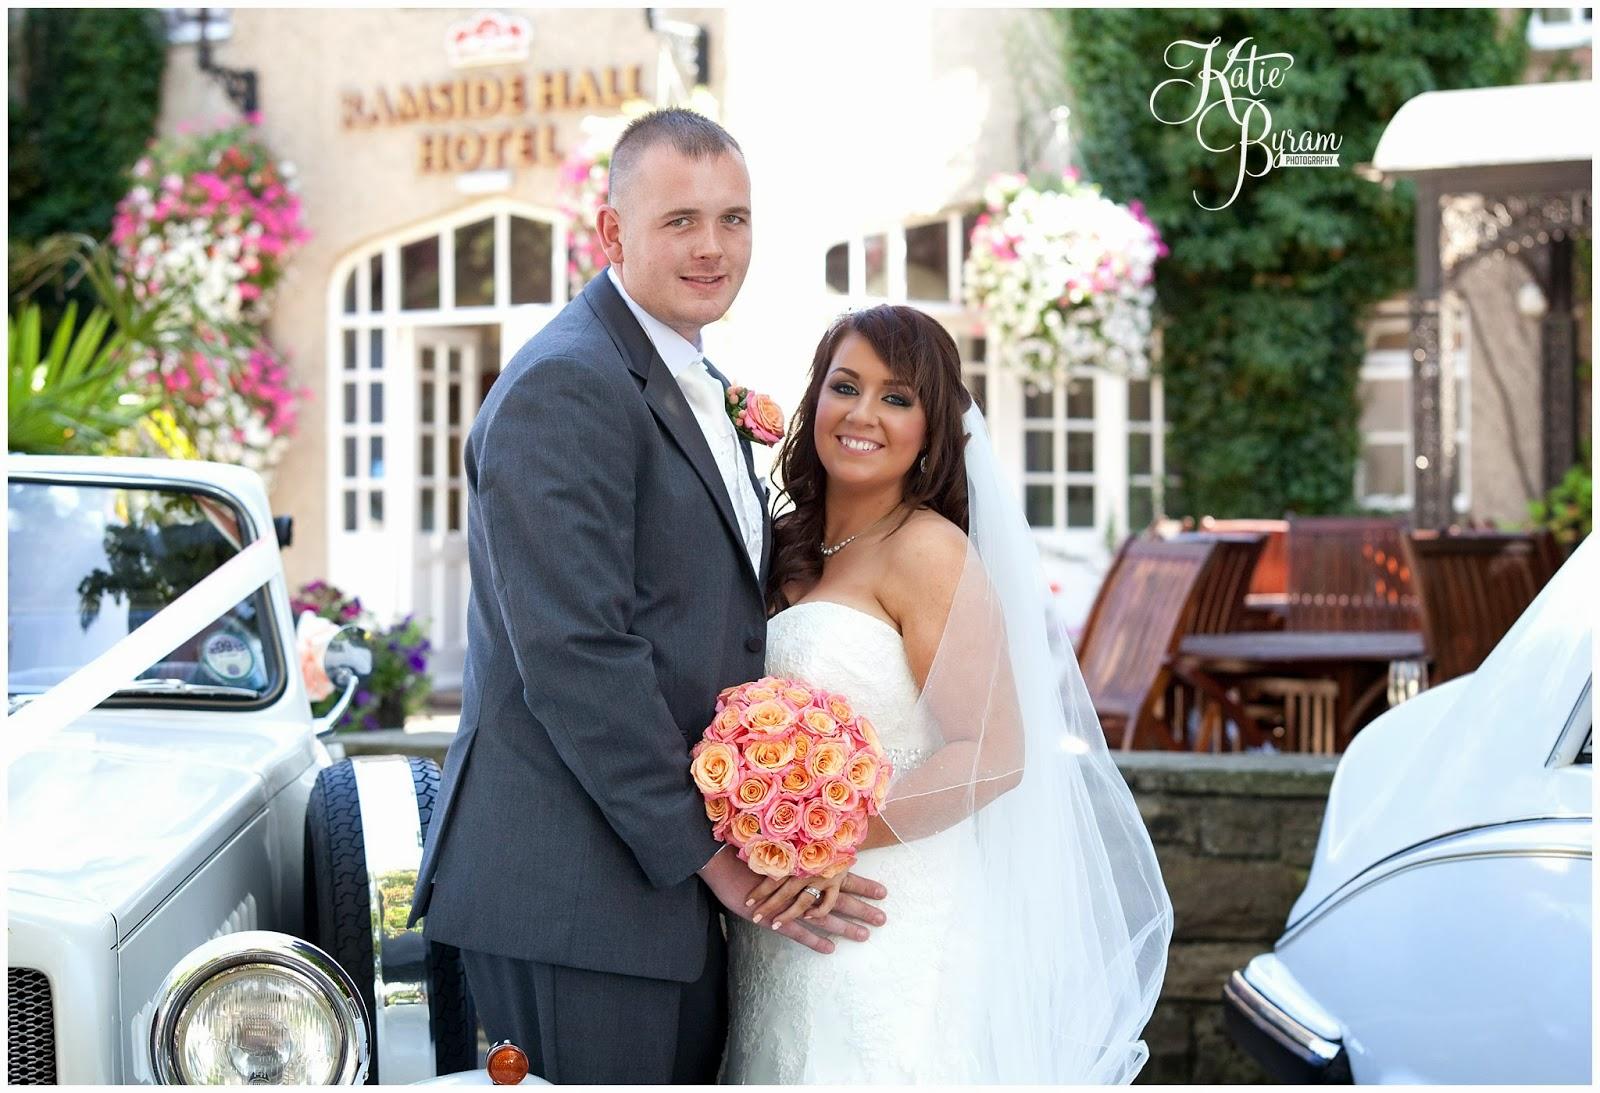 Katie byram photography fun relaxed female wedding rose wedding cars ramside hall wedding durham wedding photography coral themed wedding ombrellifo Choice Image